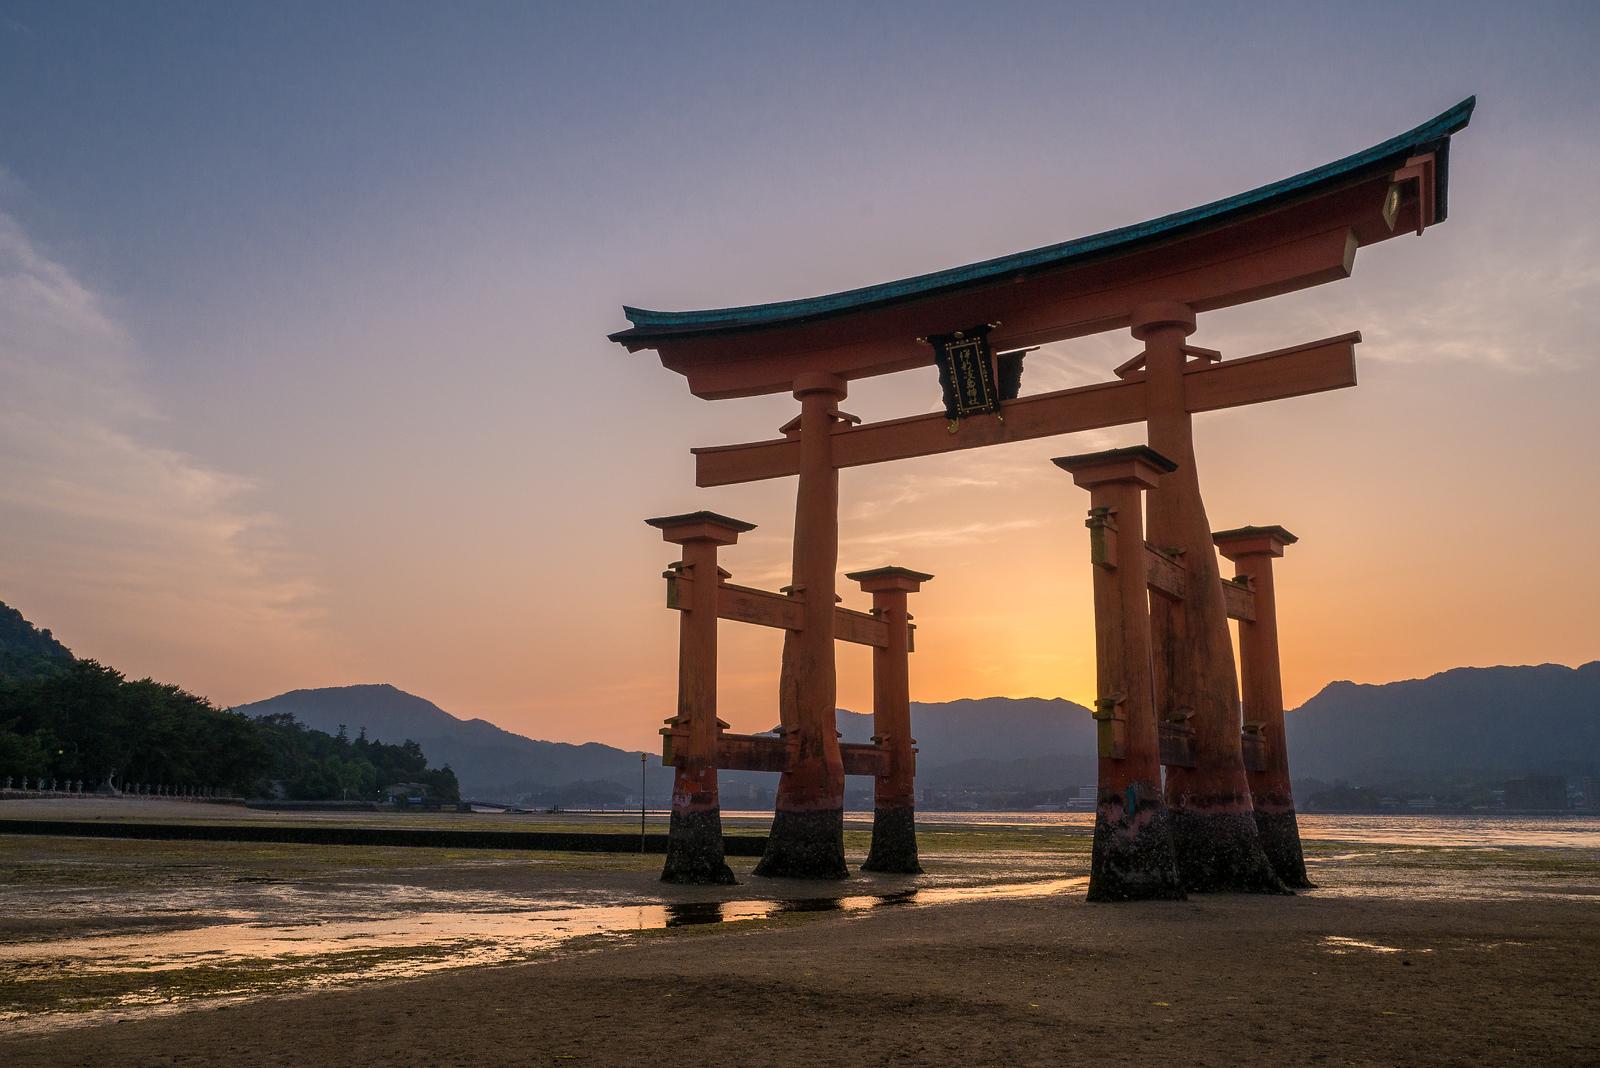 Sunet over Itsukushima Shrine on Miyajima Island